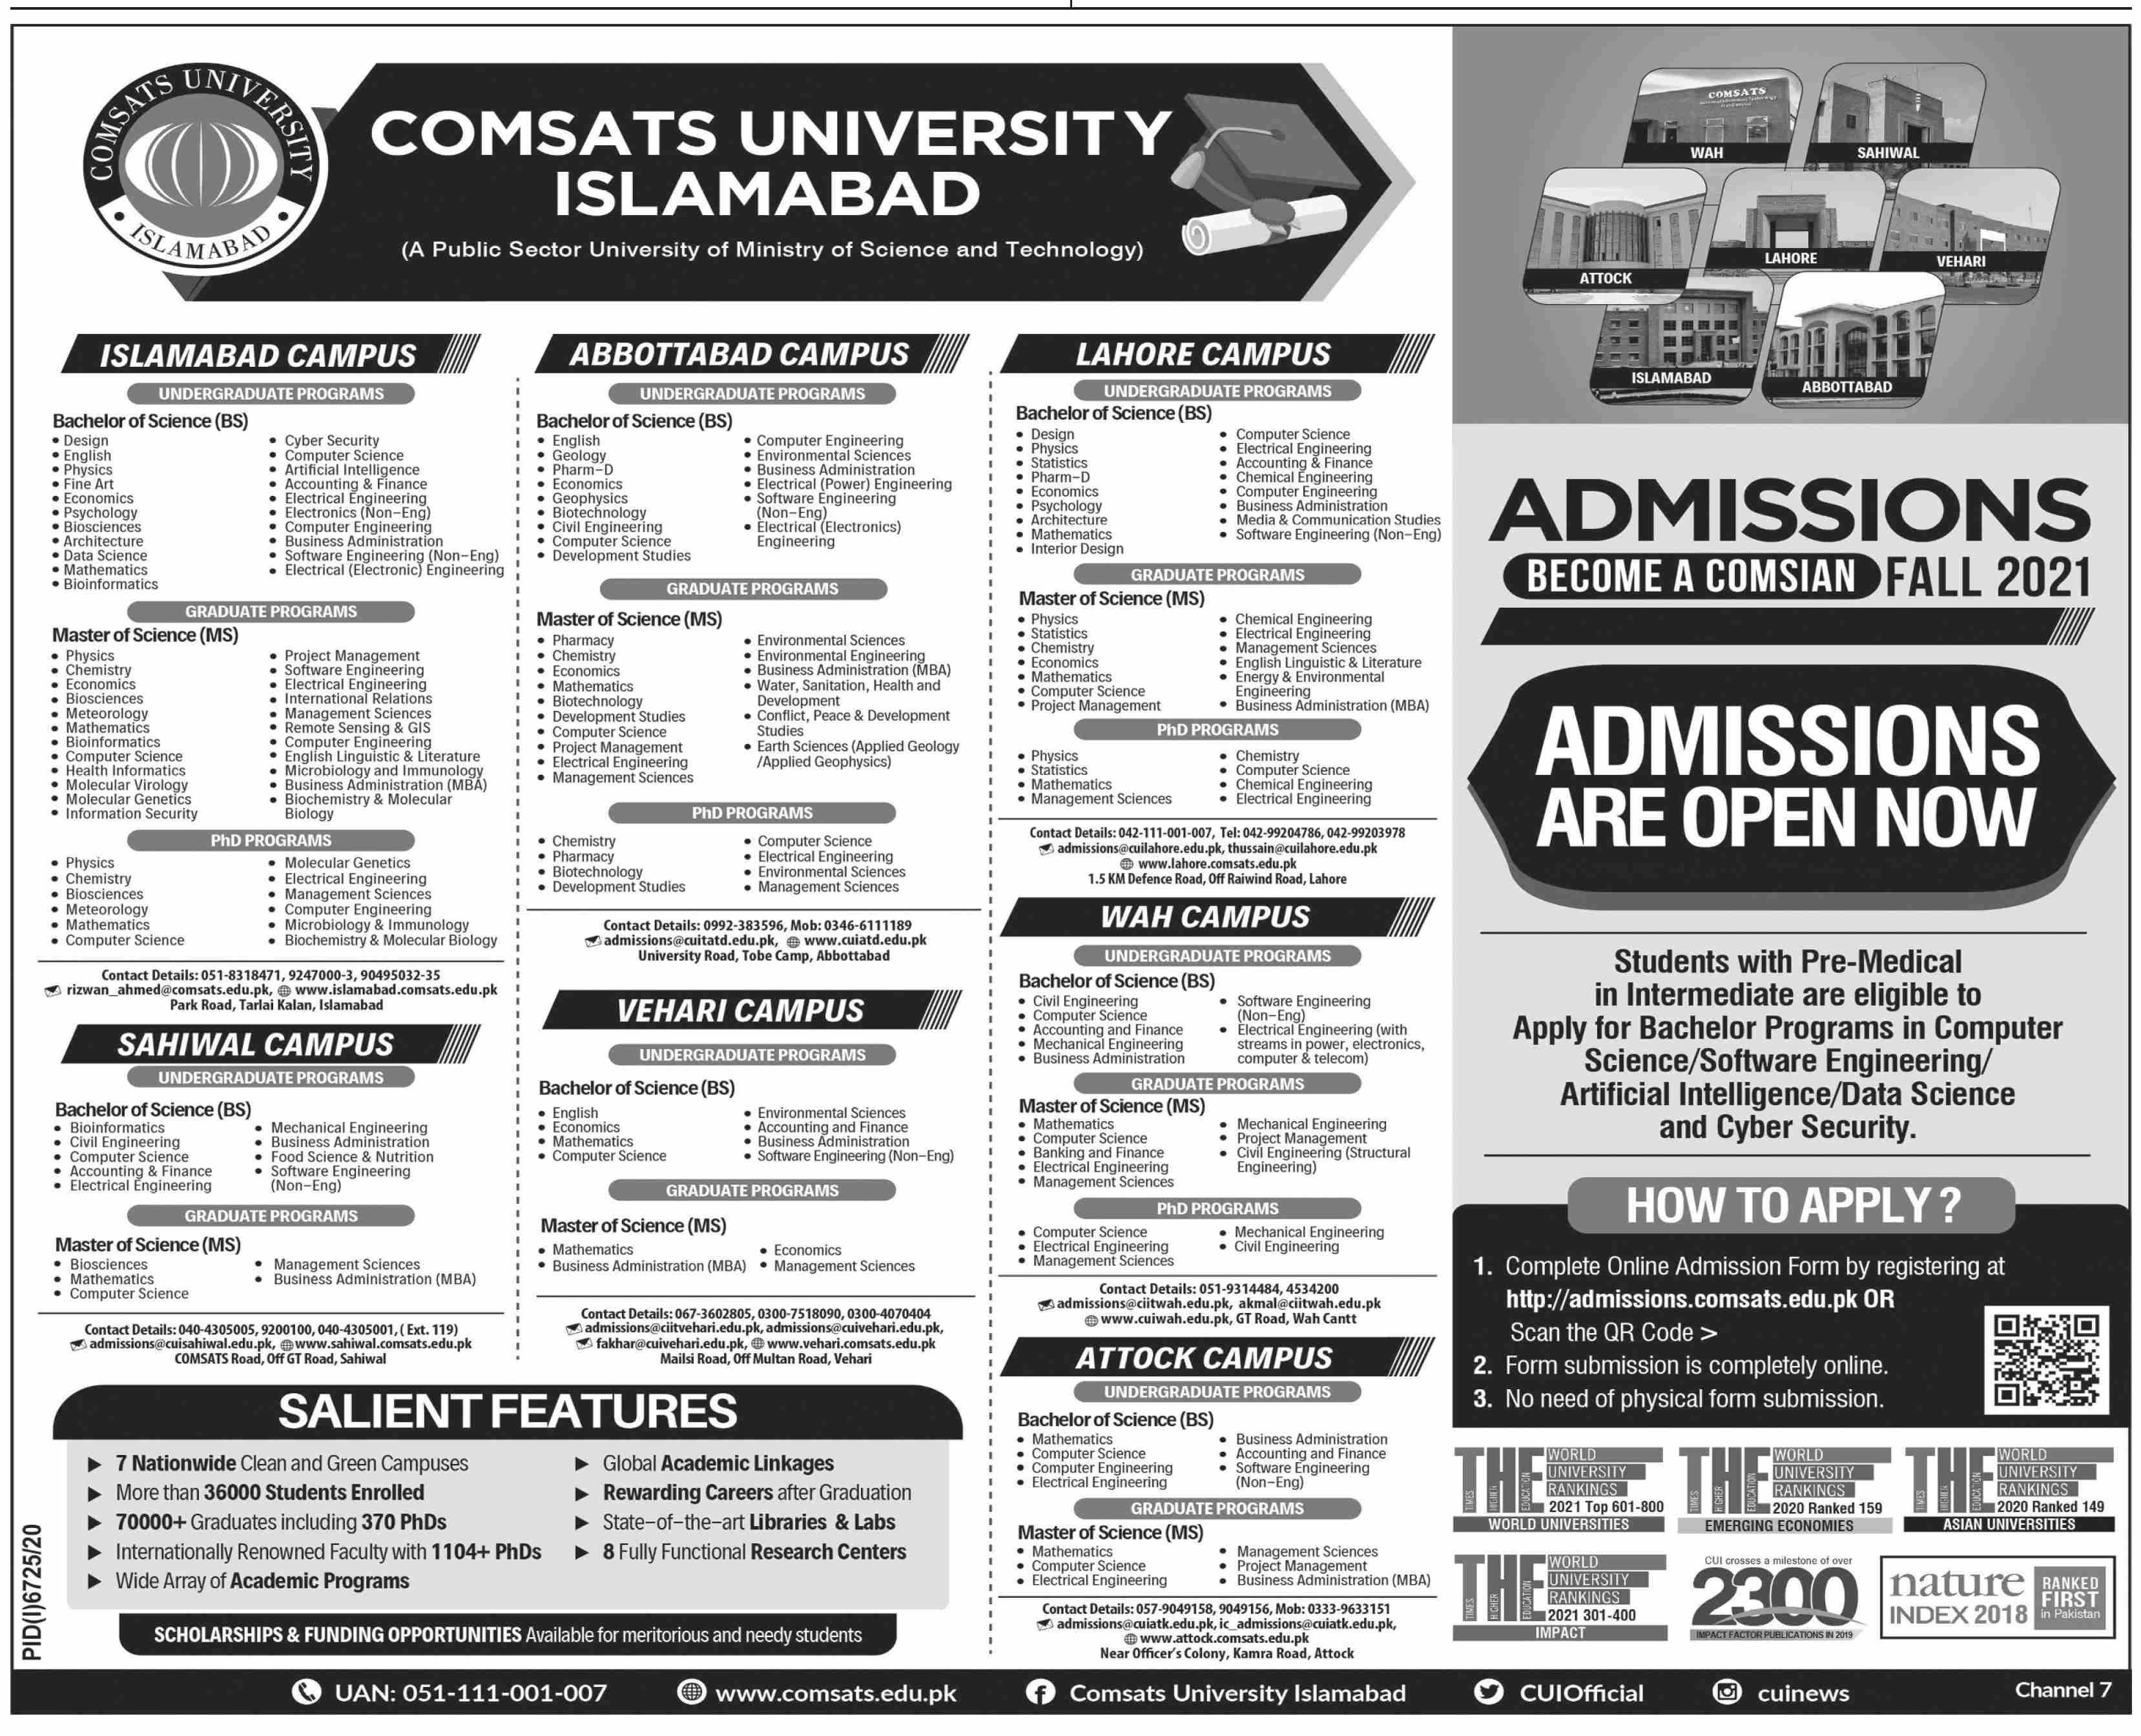 COMSATS University Islamabad Admission 2021